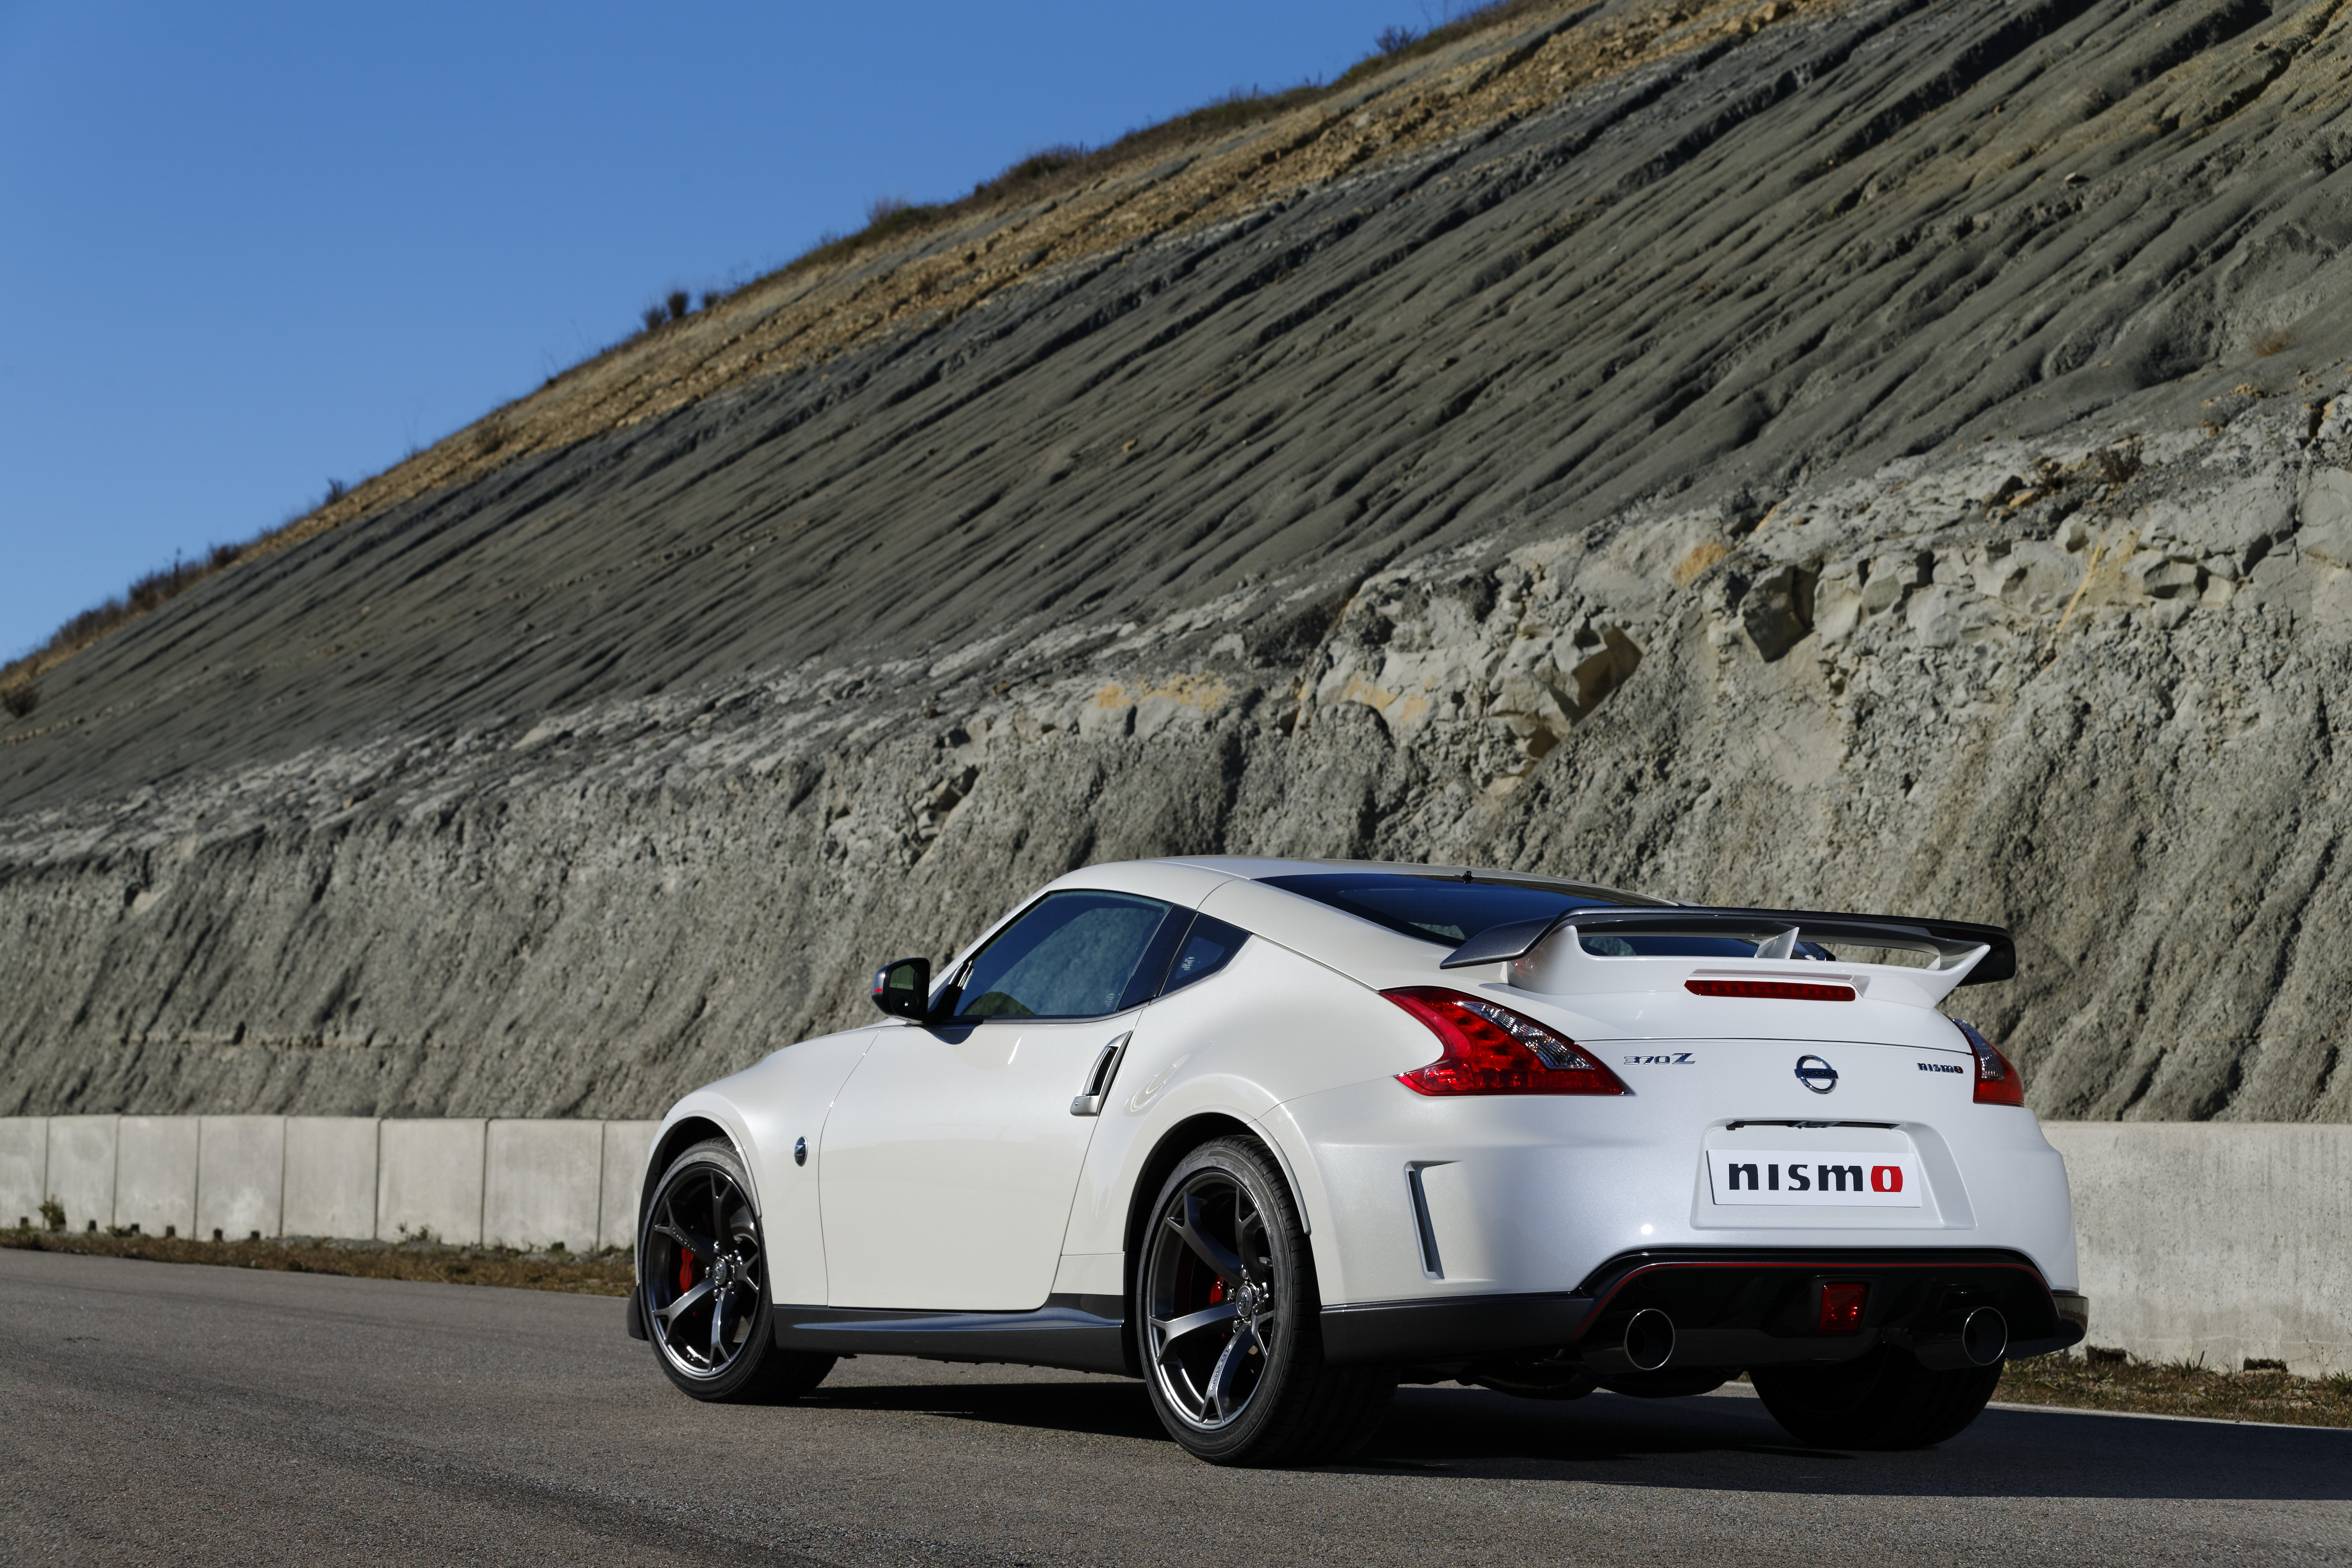 CHICAGO AUTO SHOW: Nissan Reveals 2014 370Z Nismo - AutoSpies Auto News